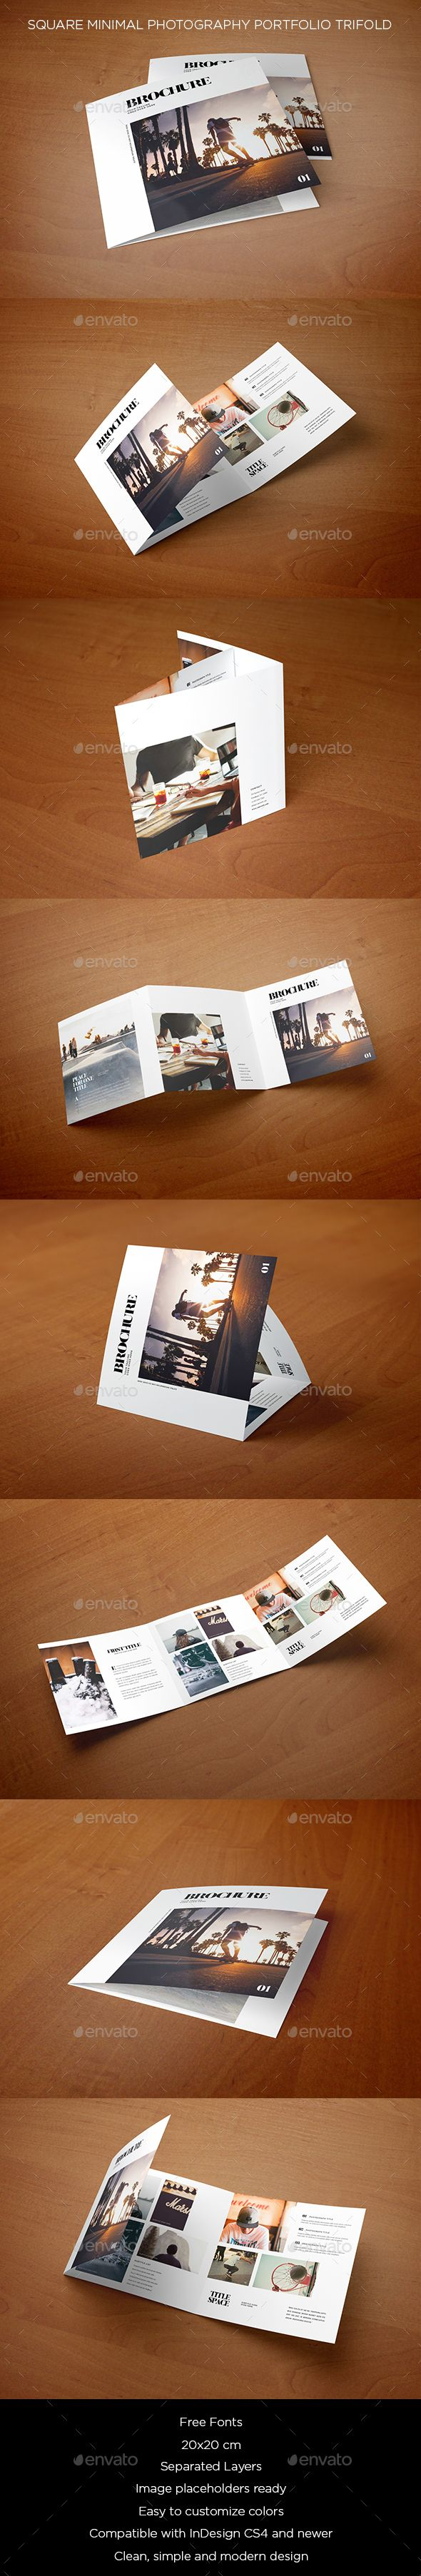 1000 ideas about photography portfolio on pinterest portfolio layout portfolio book and. Black Bedroom Furniture Sets. Home Design Ideas